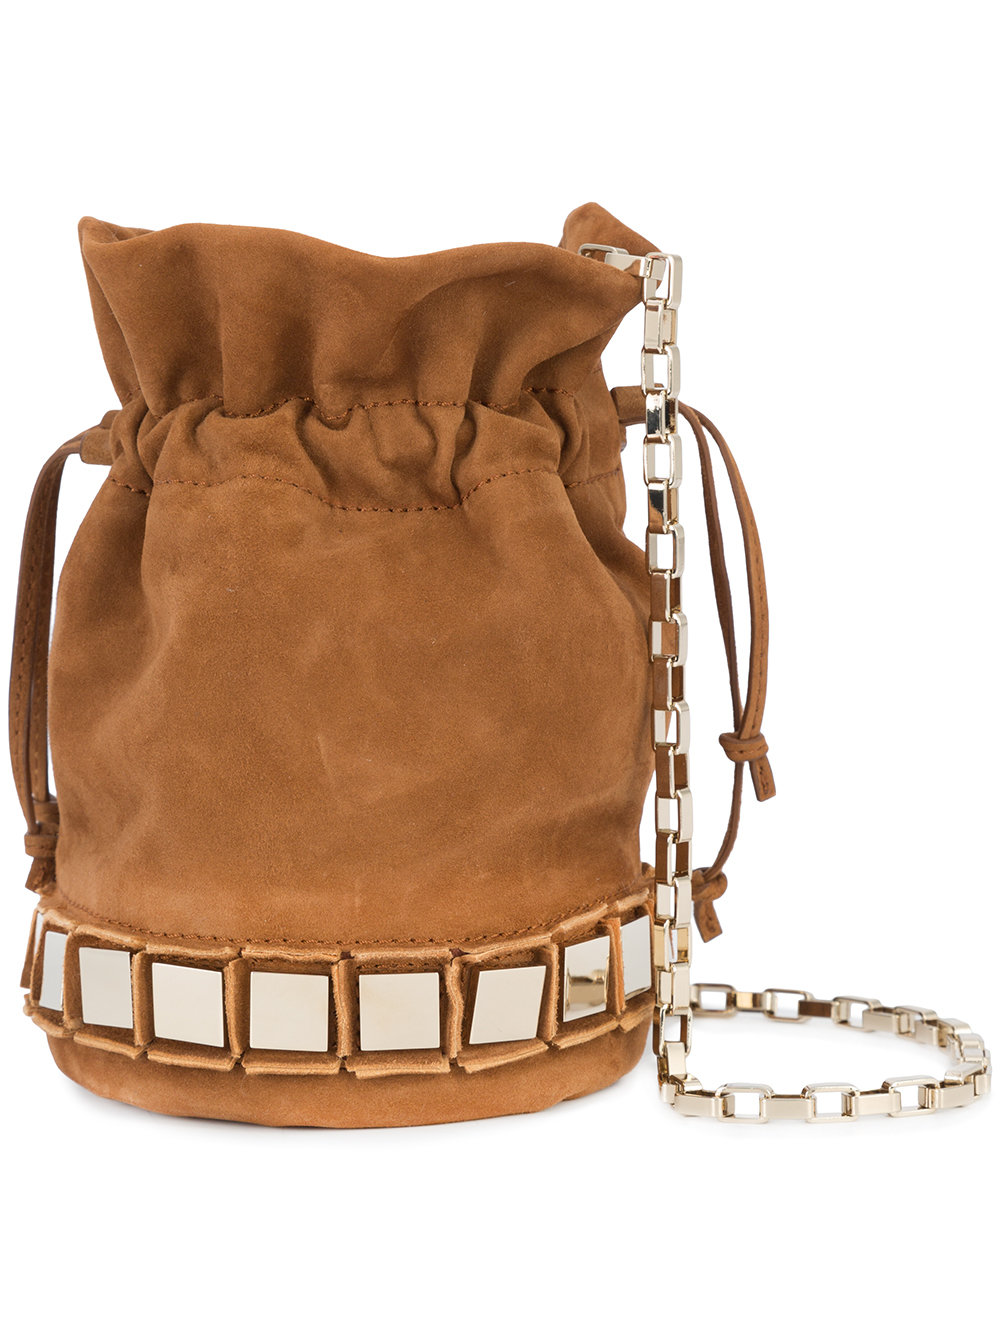 TOMASINI bucket bag - $1,100